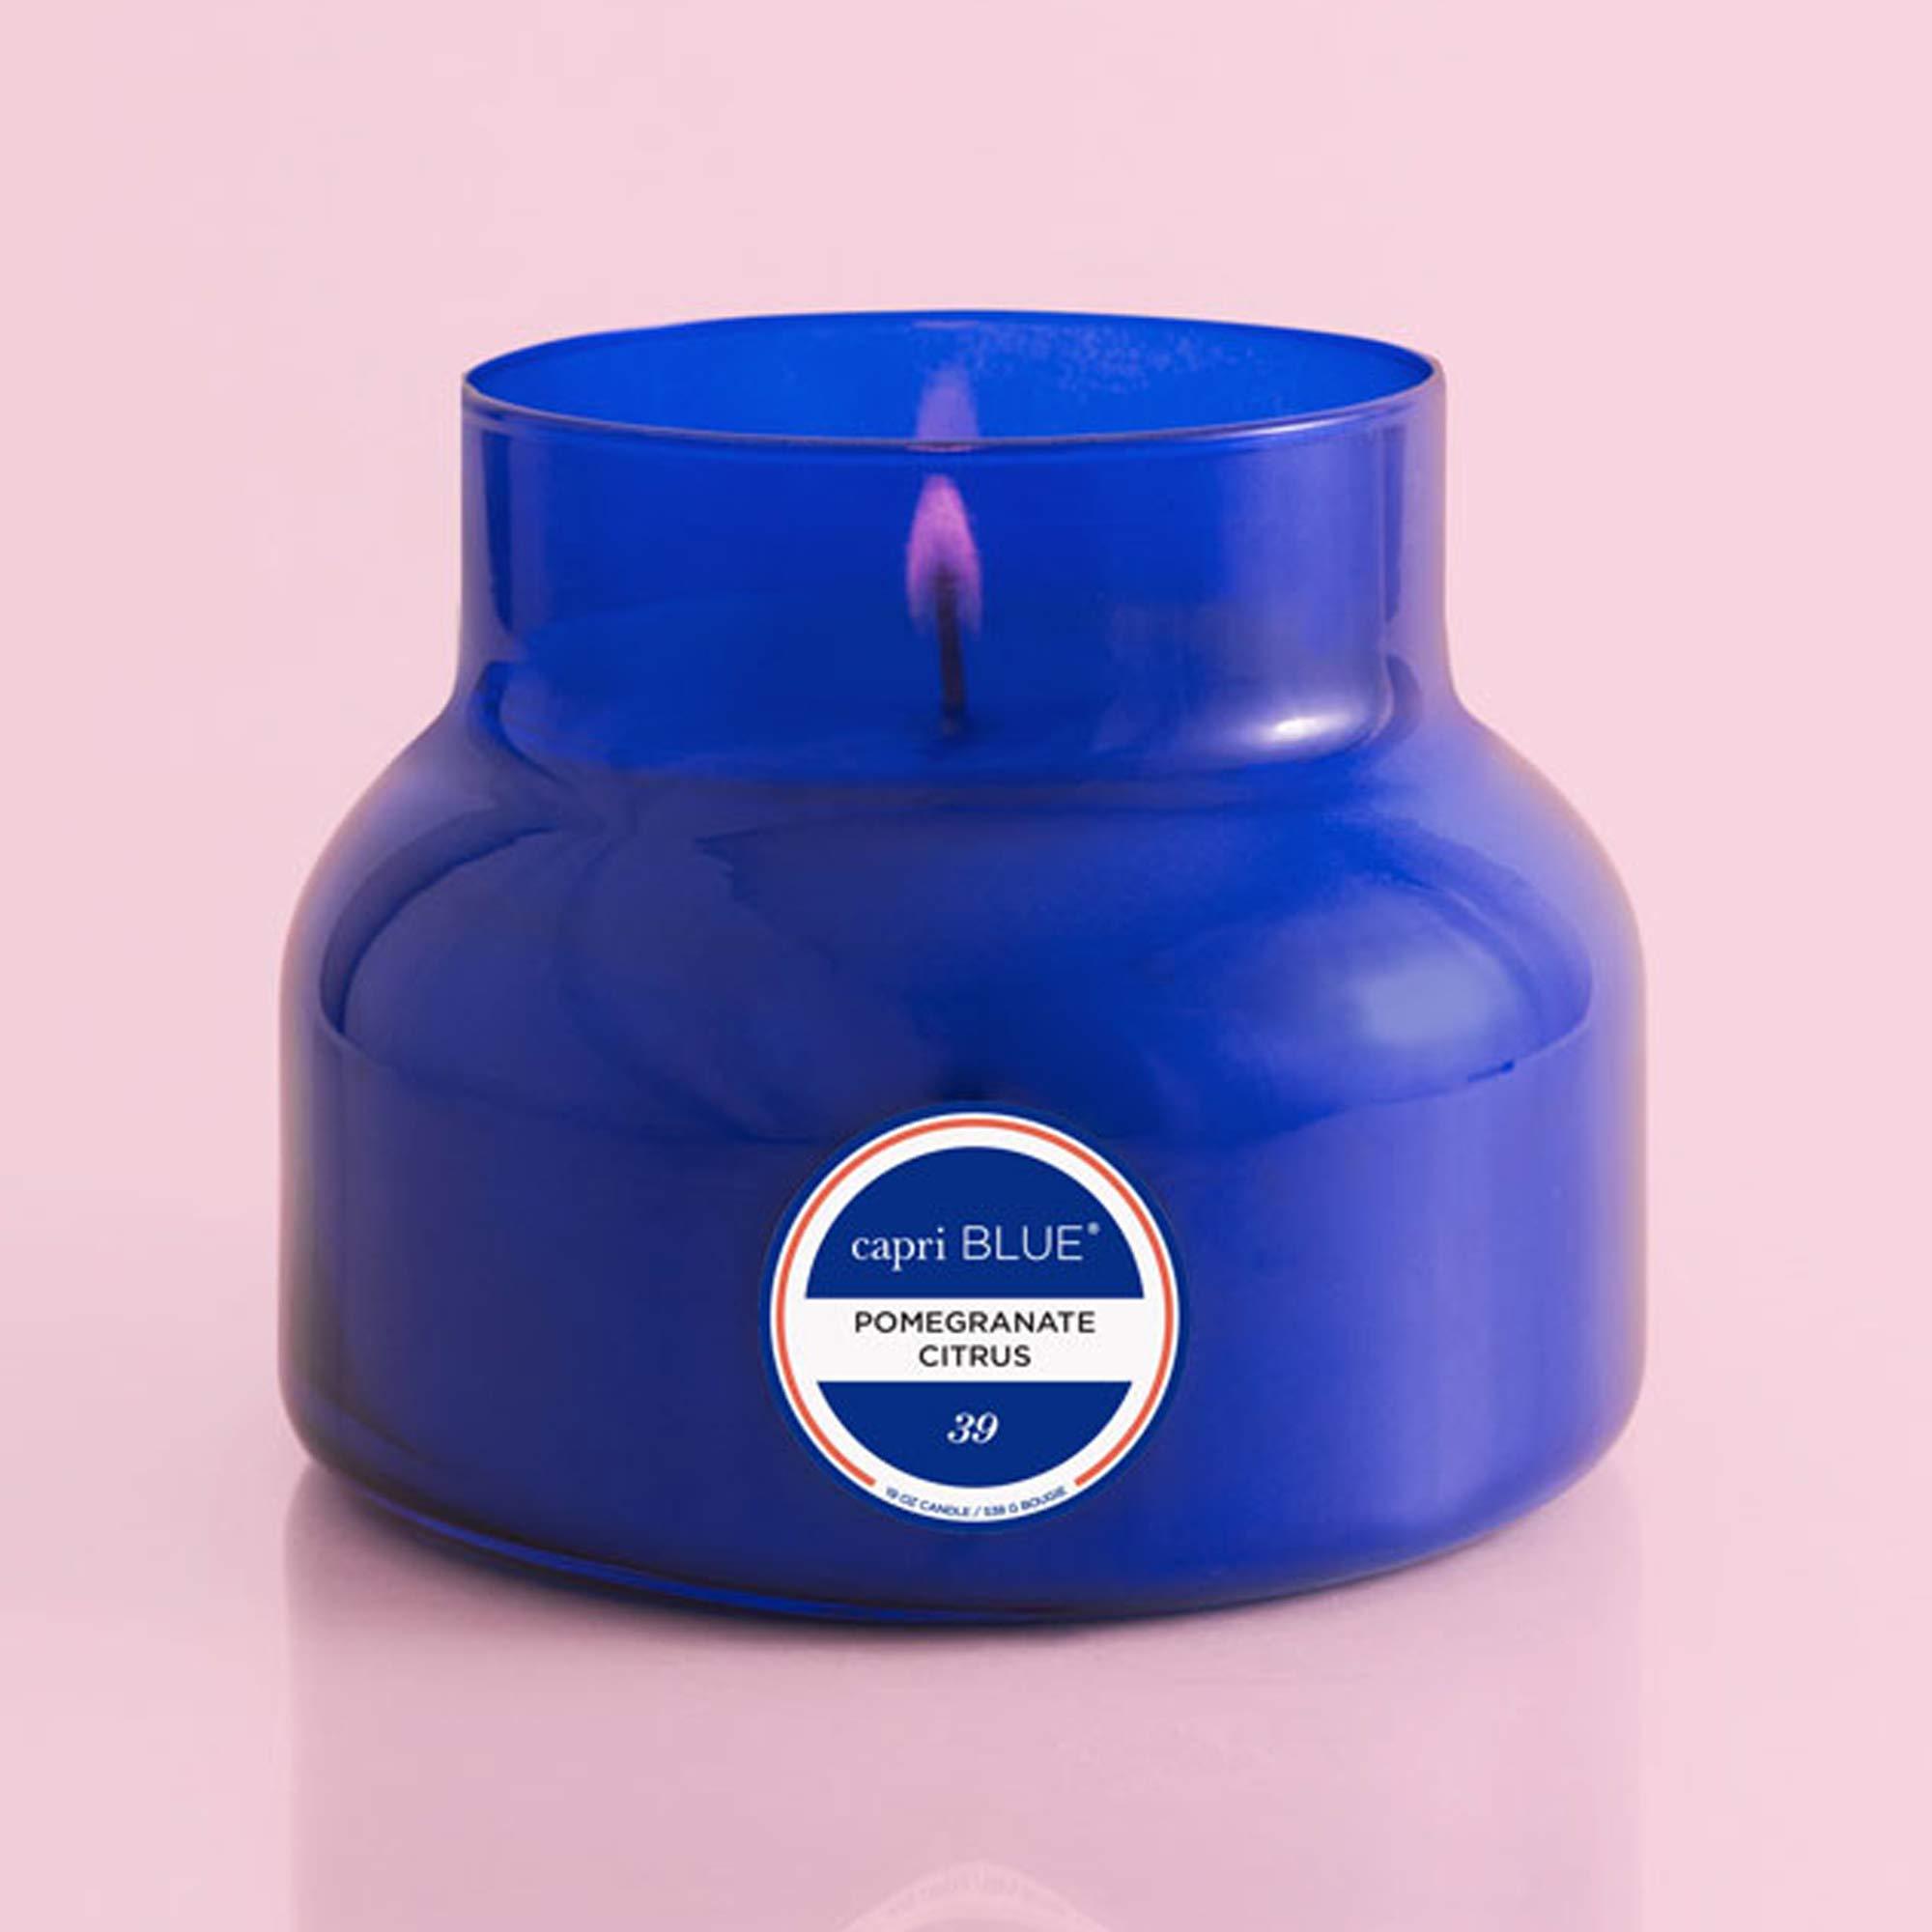 Capri Blue 19 oz Signature Pomegranate Citrus Jar Candle (4 pack), Pomegranate Citrus, One Size by Capri Blue (Image #2)